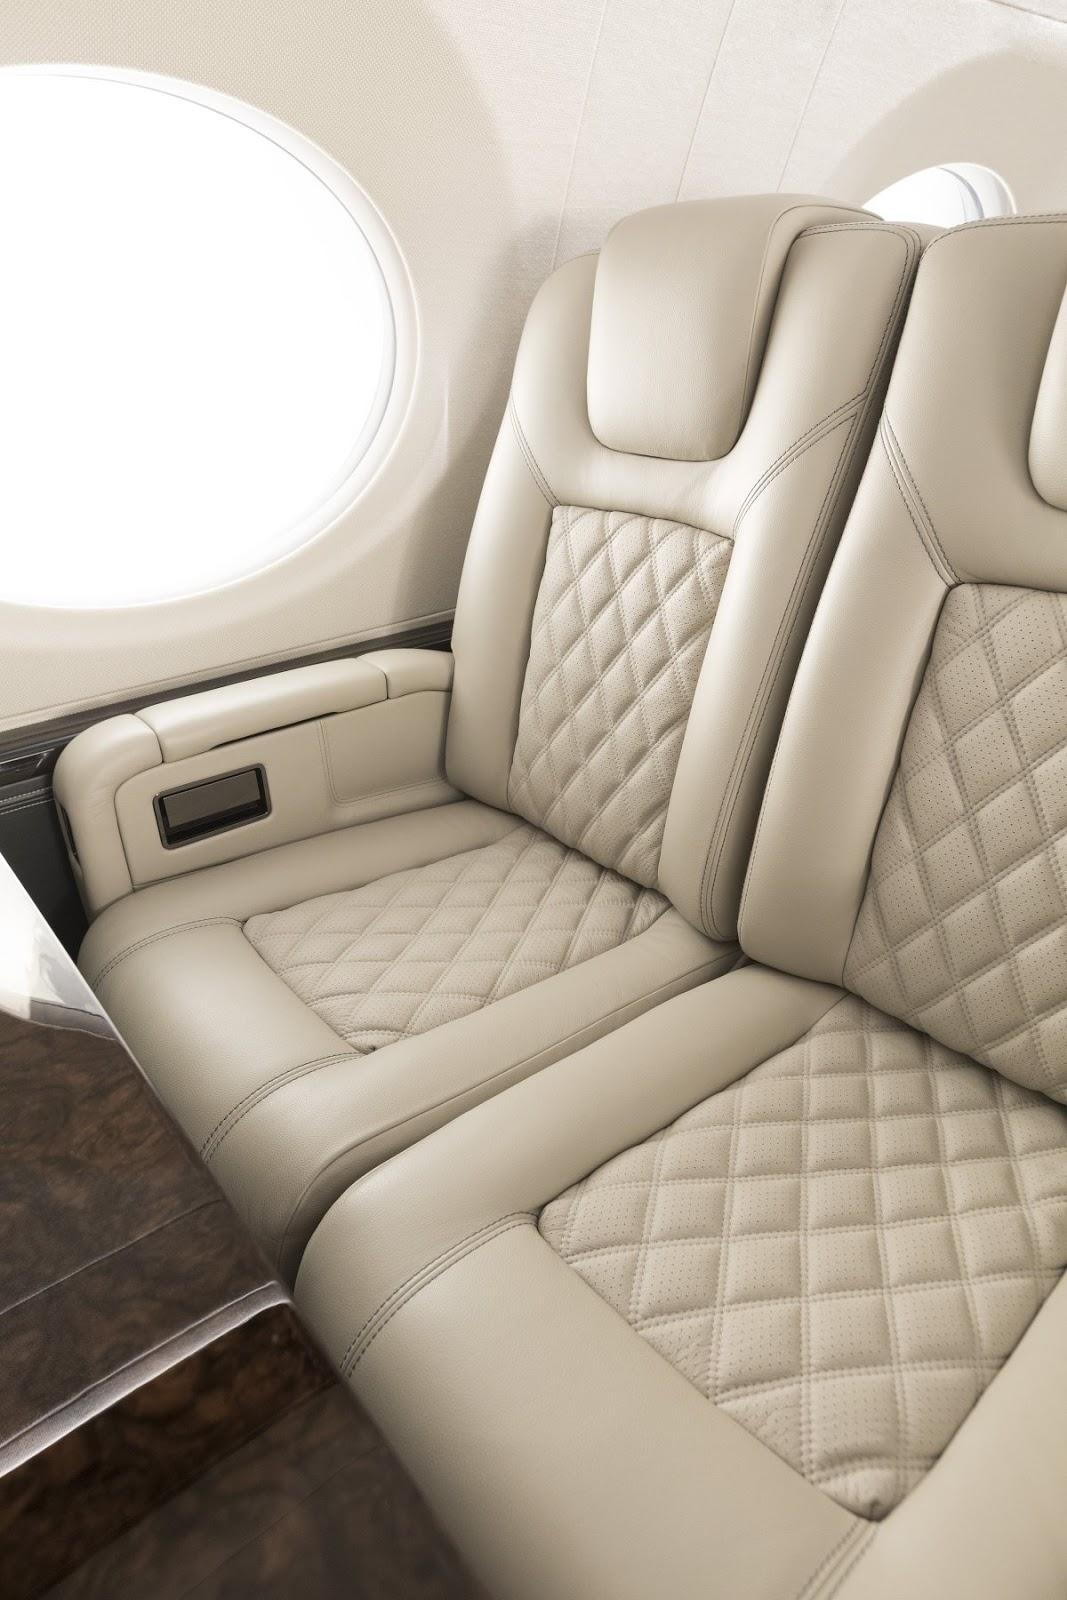 Wow Gulfstreams Next Gen 45 Million G500 Private Jet Xiaomi Redmi Note 2 Case Spigen Gid Abcxirn2spgl View As